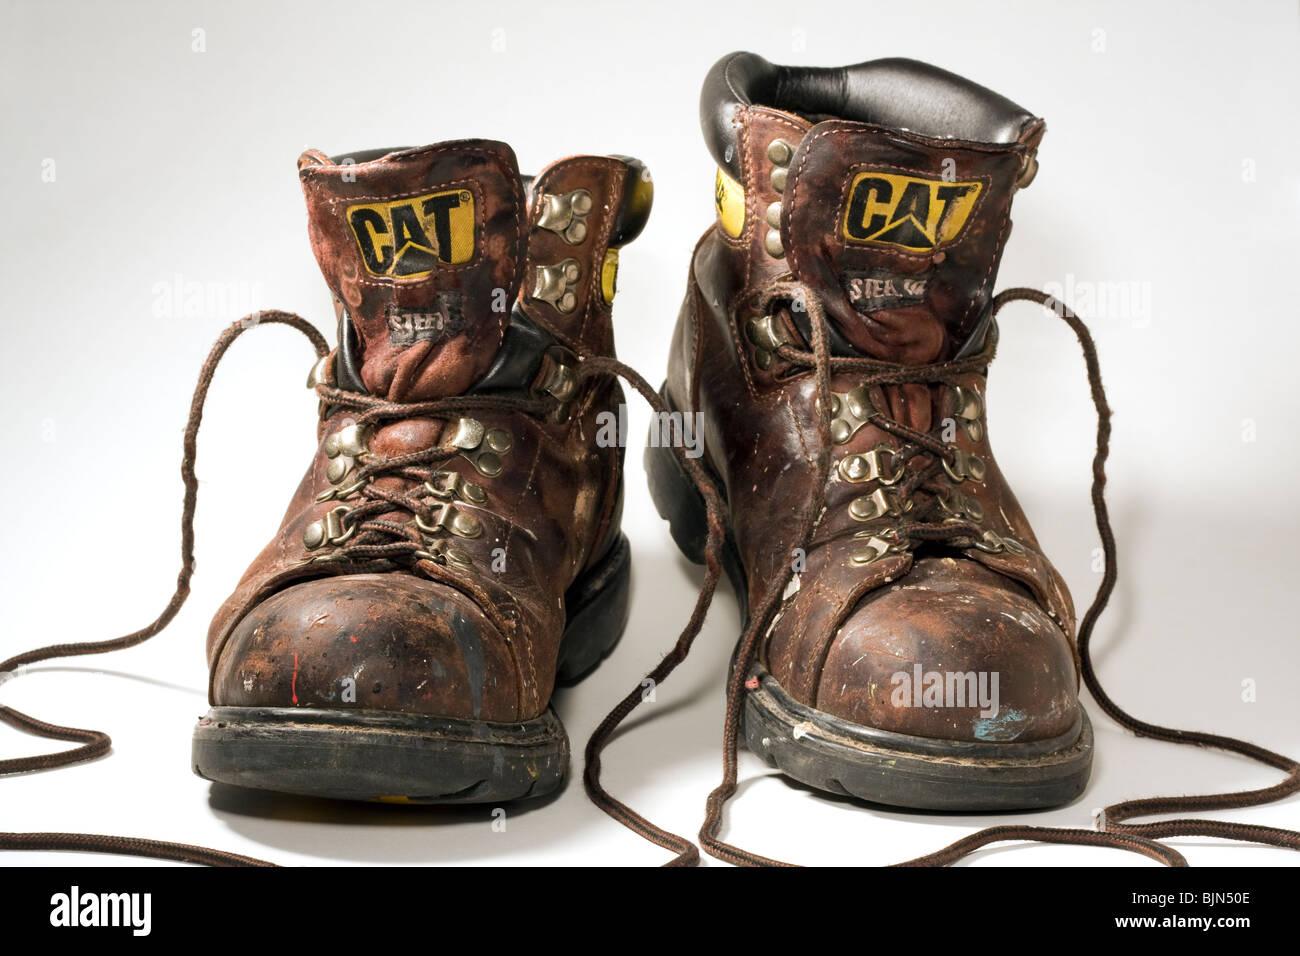 b3d2233d Puntera de acero Caterpillar botas de trabajo sobre fondo blanco ...